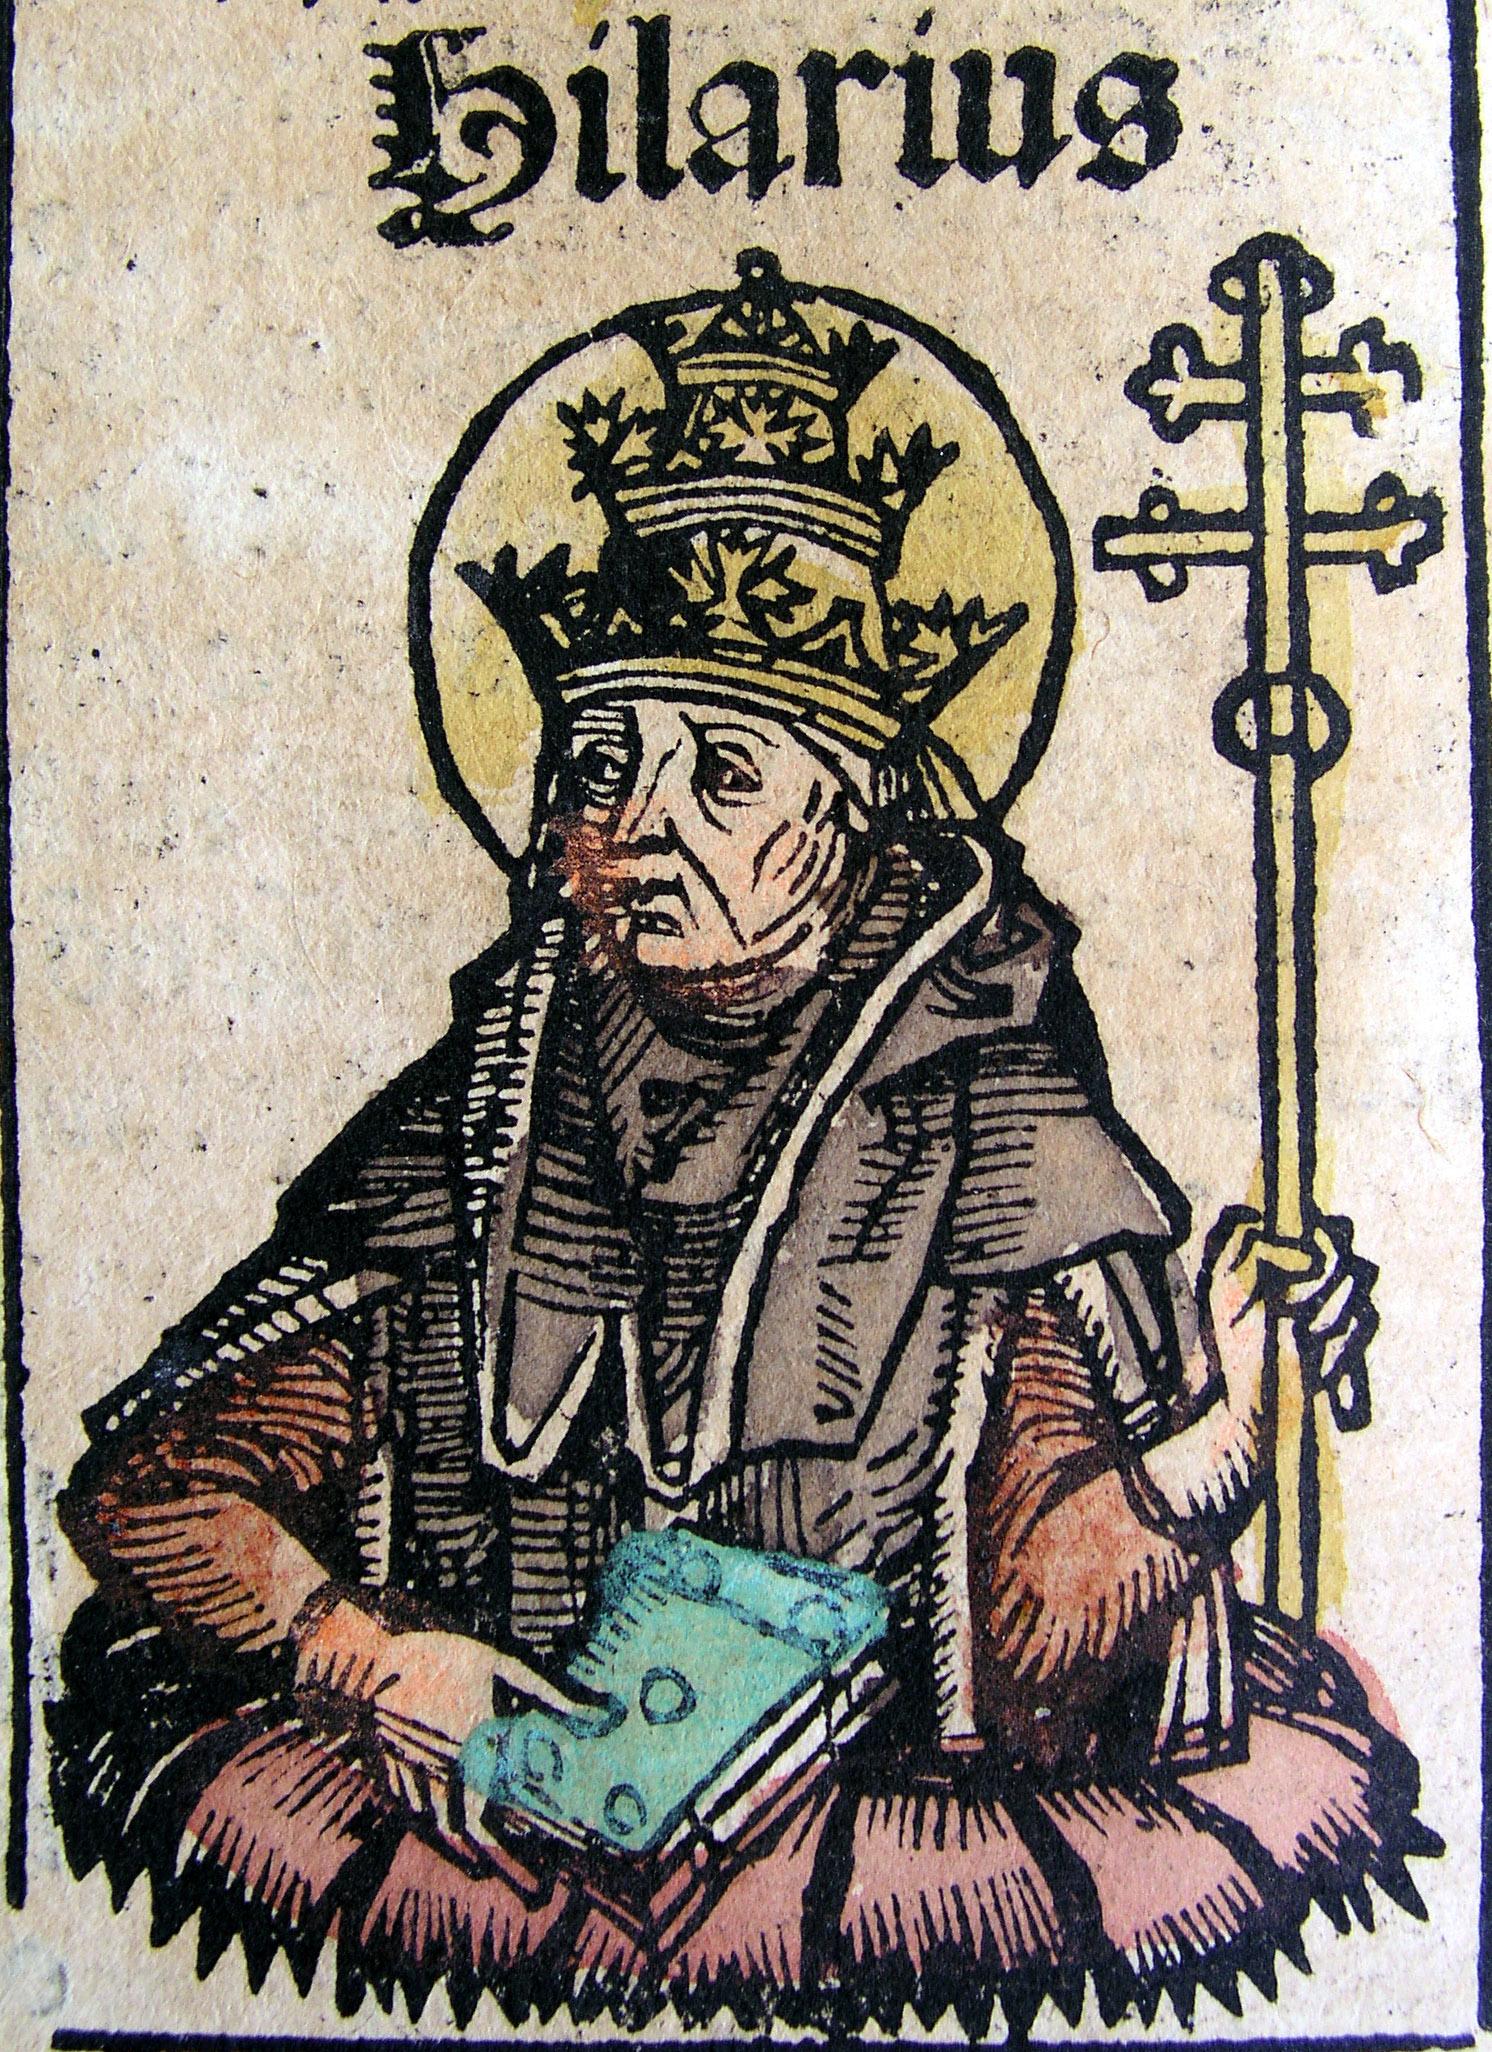 https://upload.wikimedia.org/wikipedia/commons/d/dd/Nuremberg_chronicles_-_Hilarius%2C_Pope_%28CXXXVIv%29.jpg